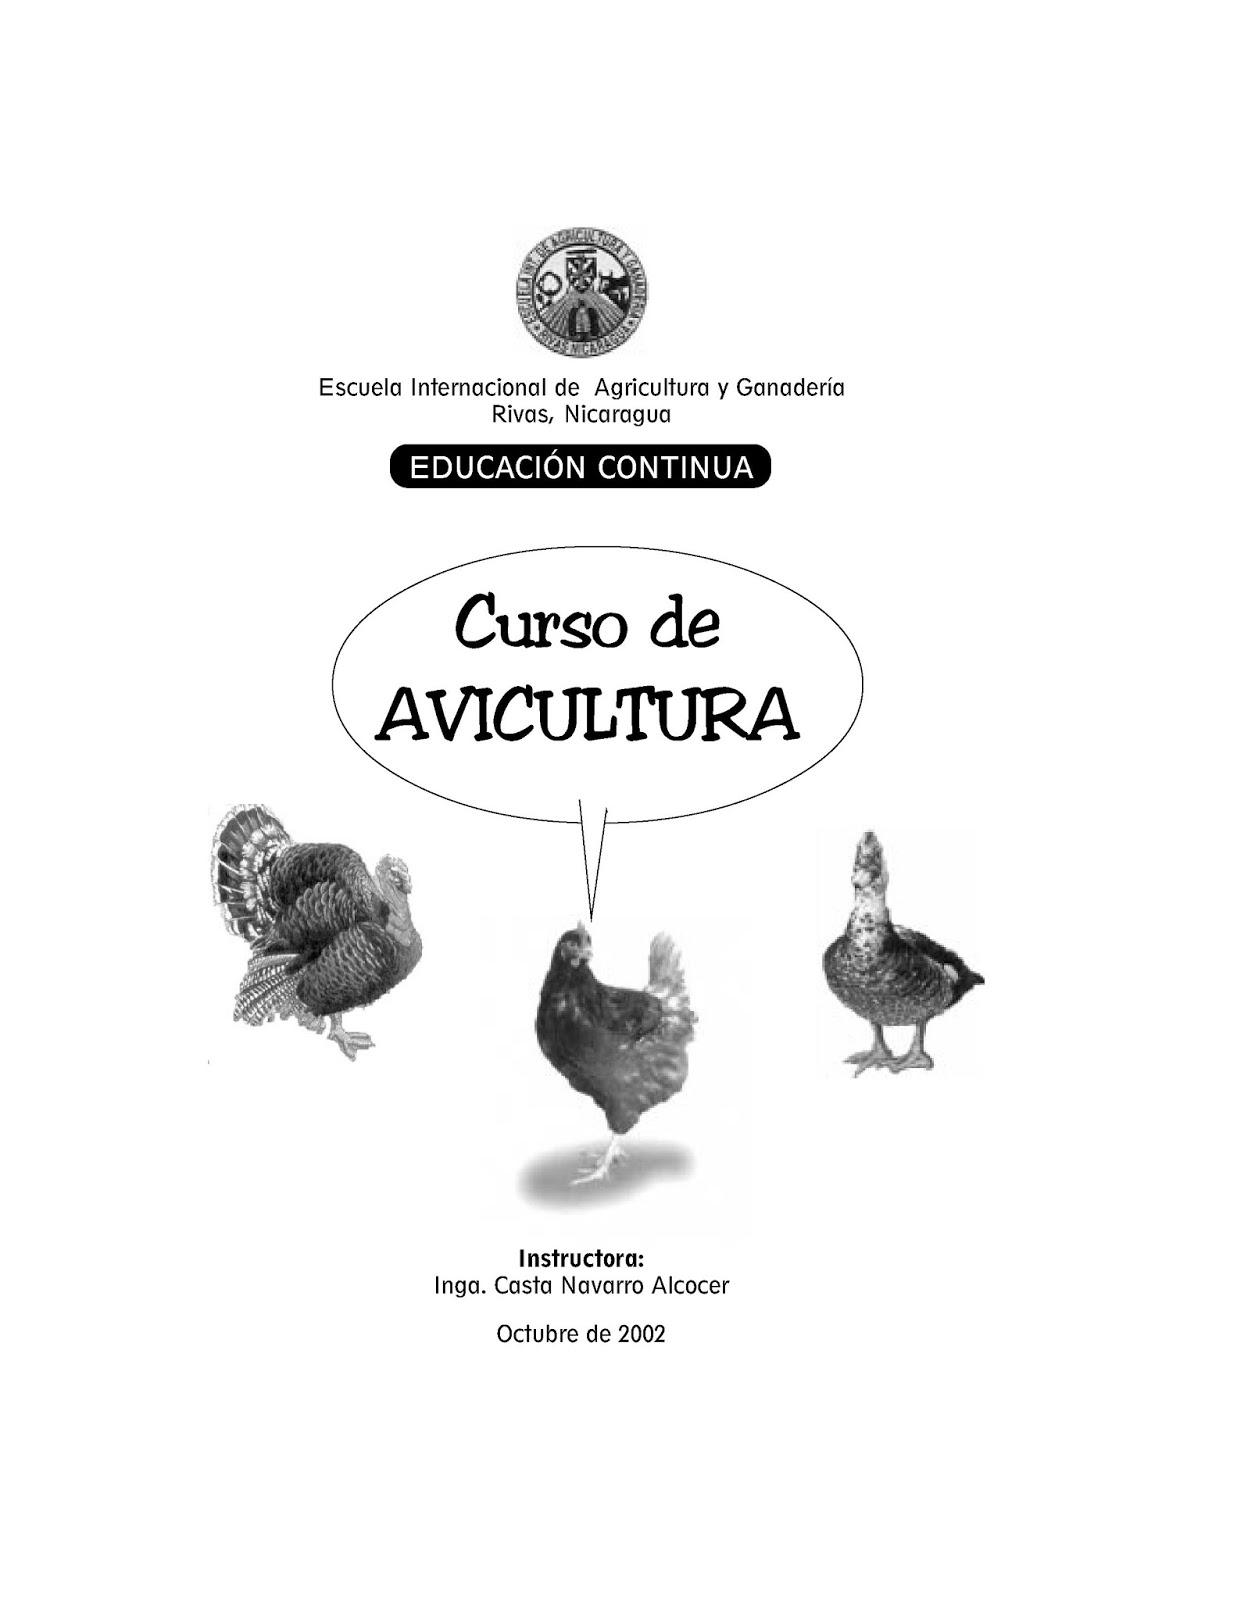 Curso de avicultura